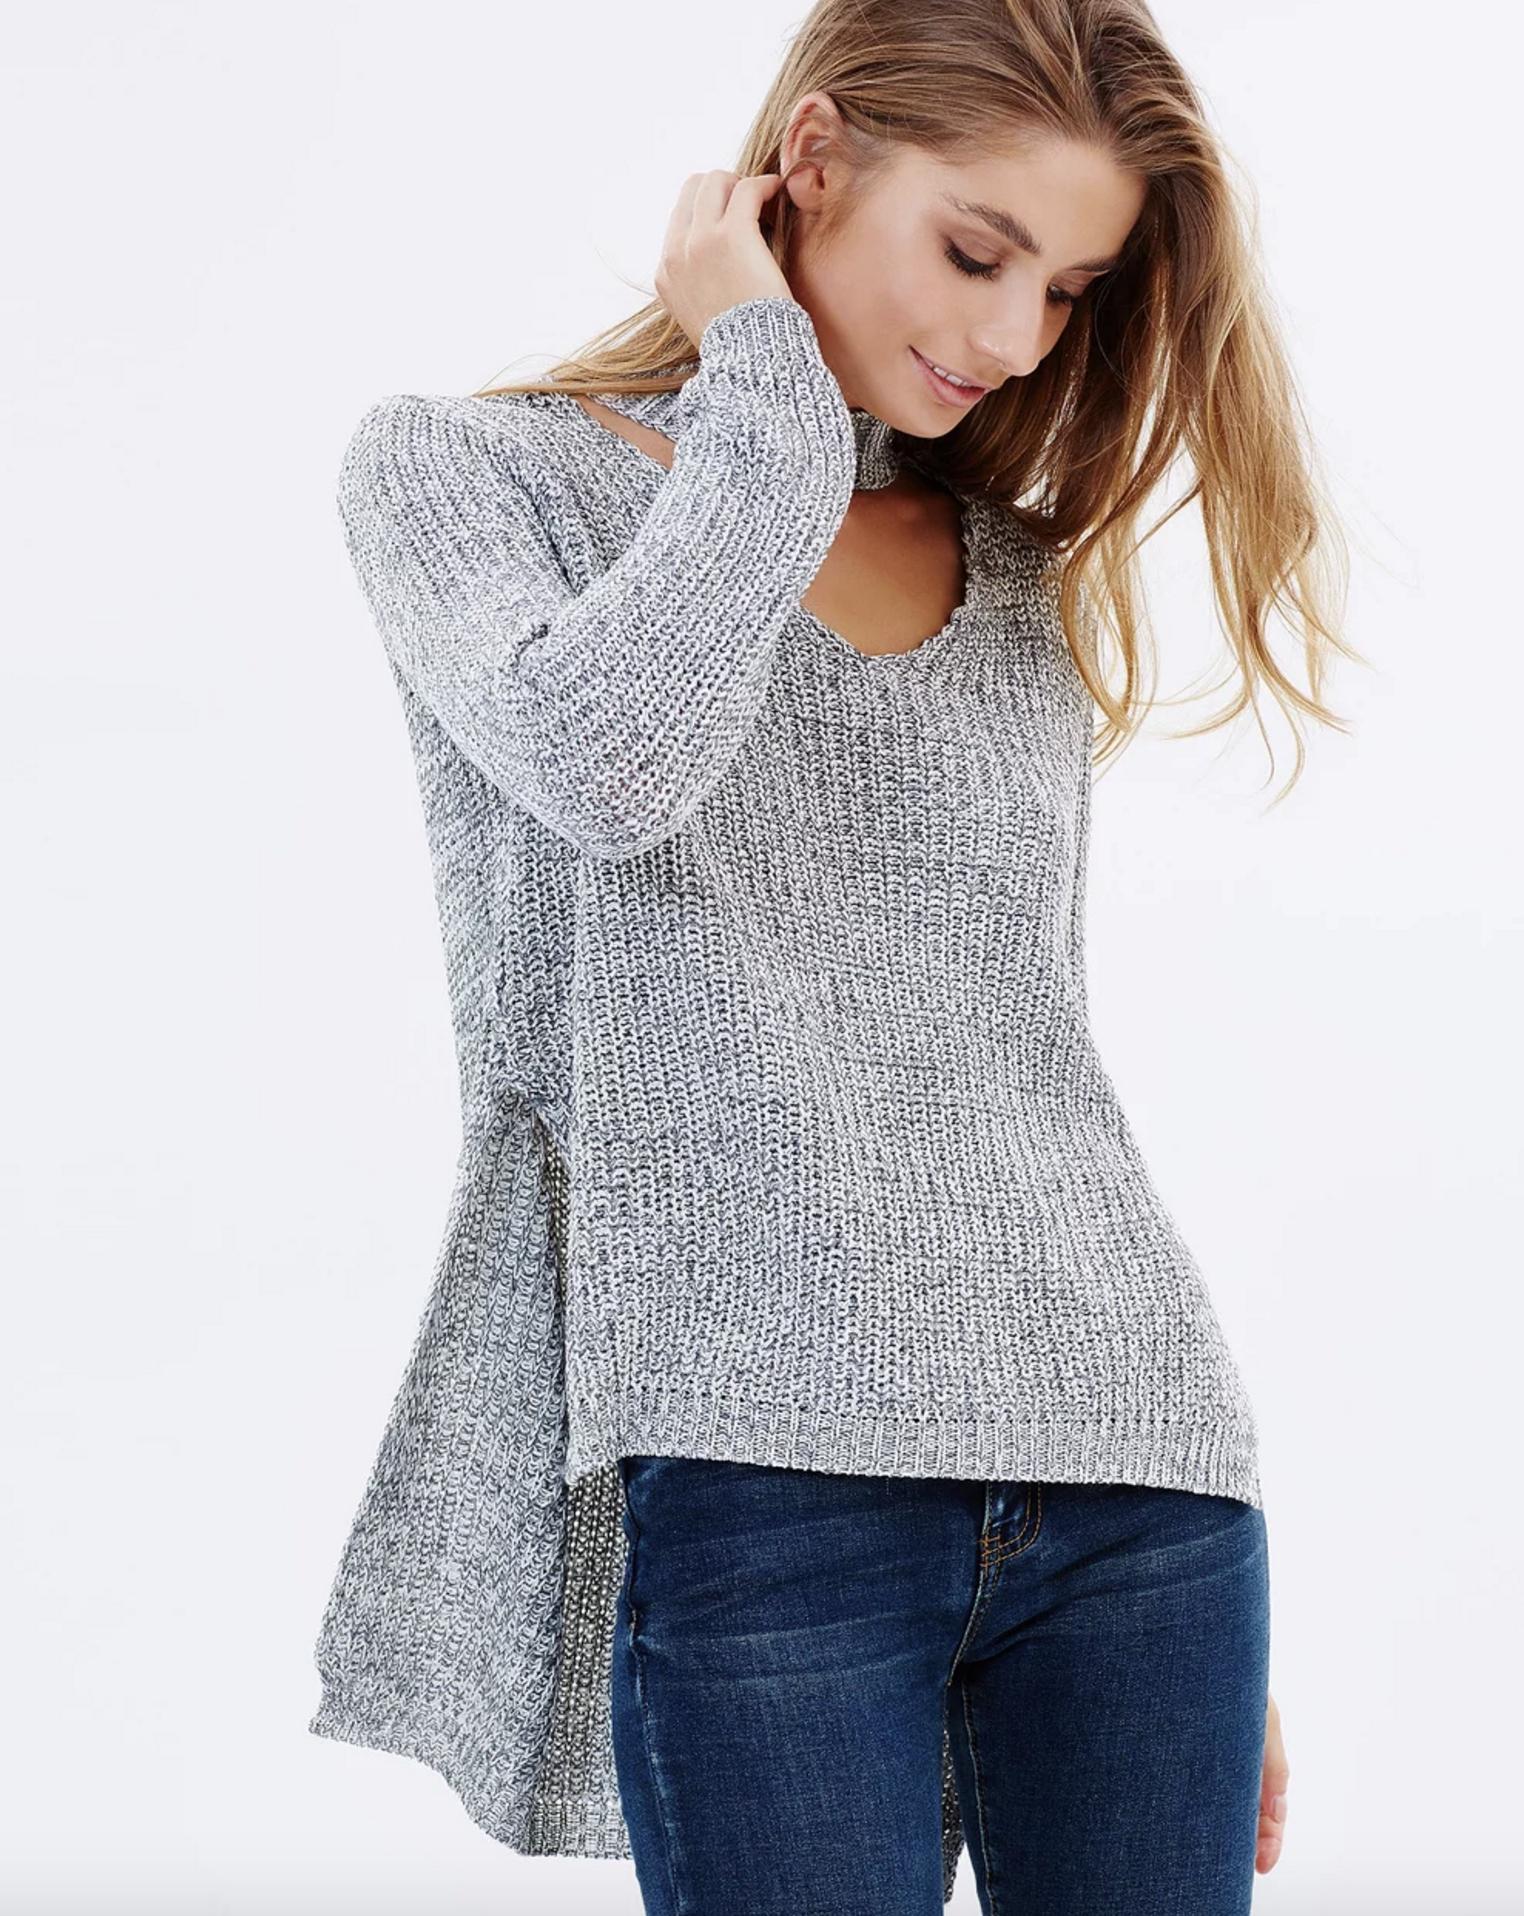 Sass justice keyhole knit $79.95